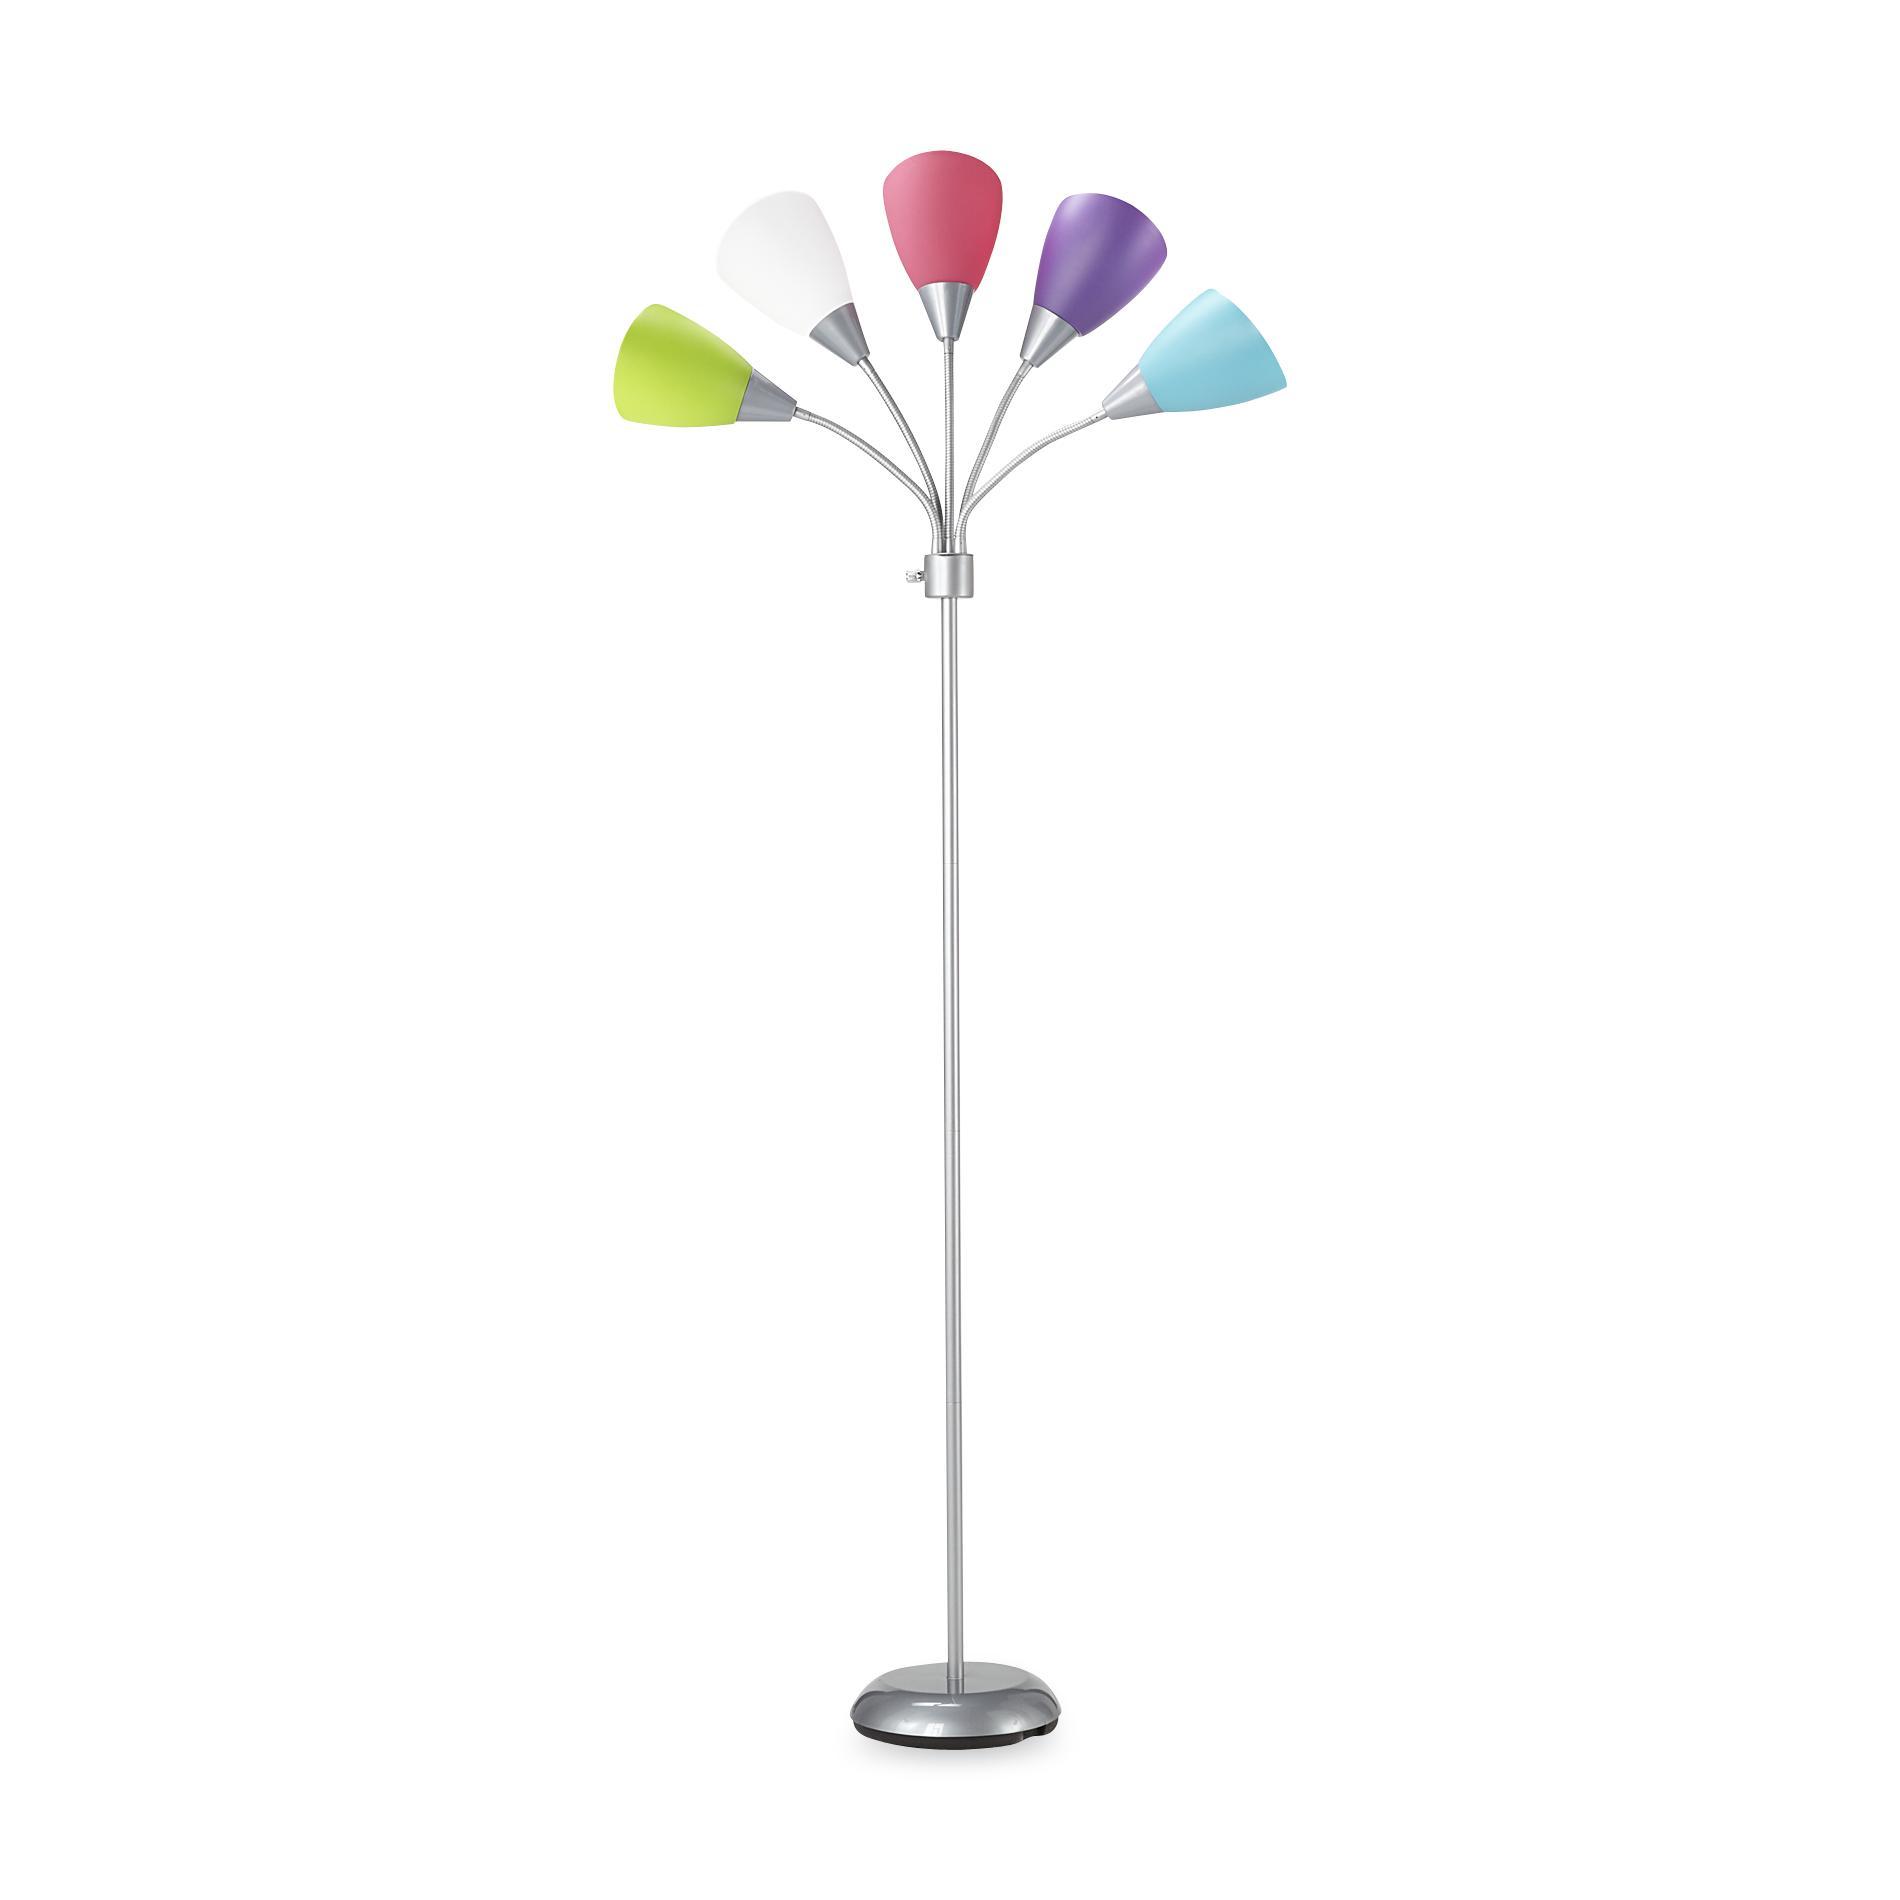 Essential Home Chrome/Multicolor 5-Head Gooseneck Floor Lamp